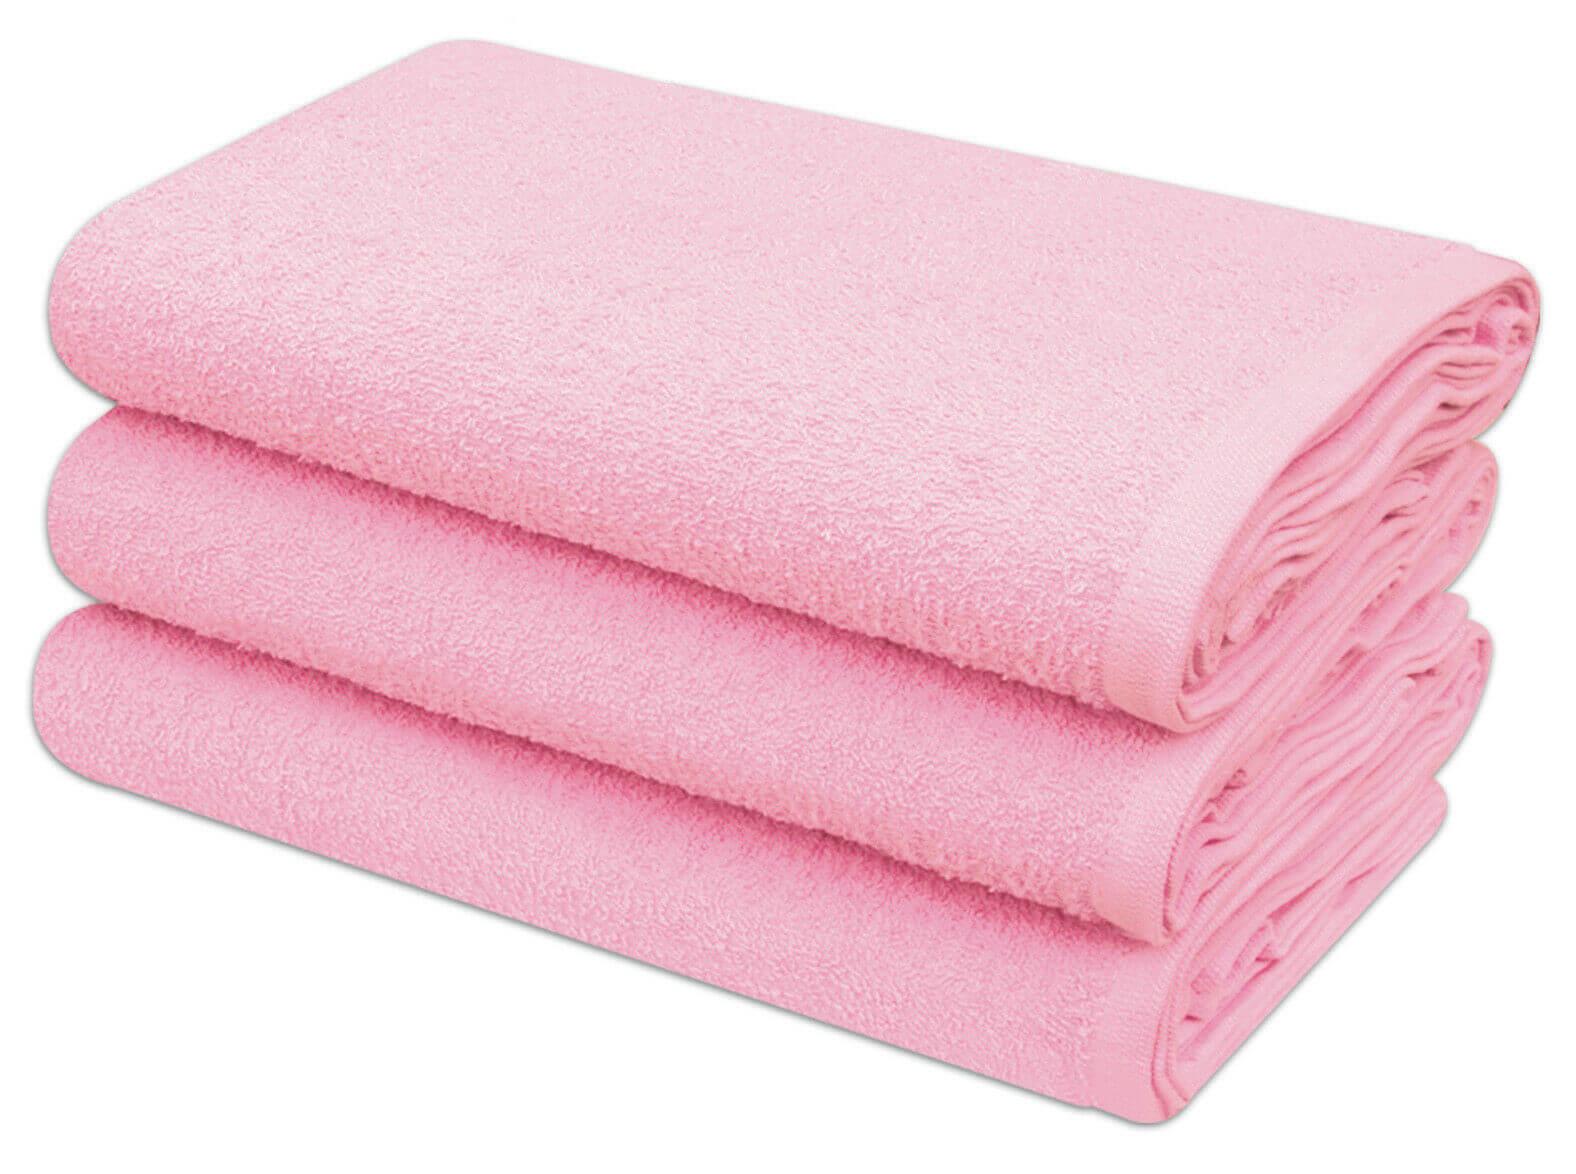 60 x 60 cm Premium Quality  Terry Towelling Premium Quality 100/% Cotton Nappies